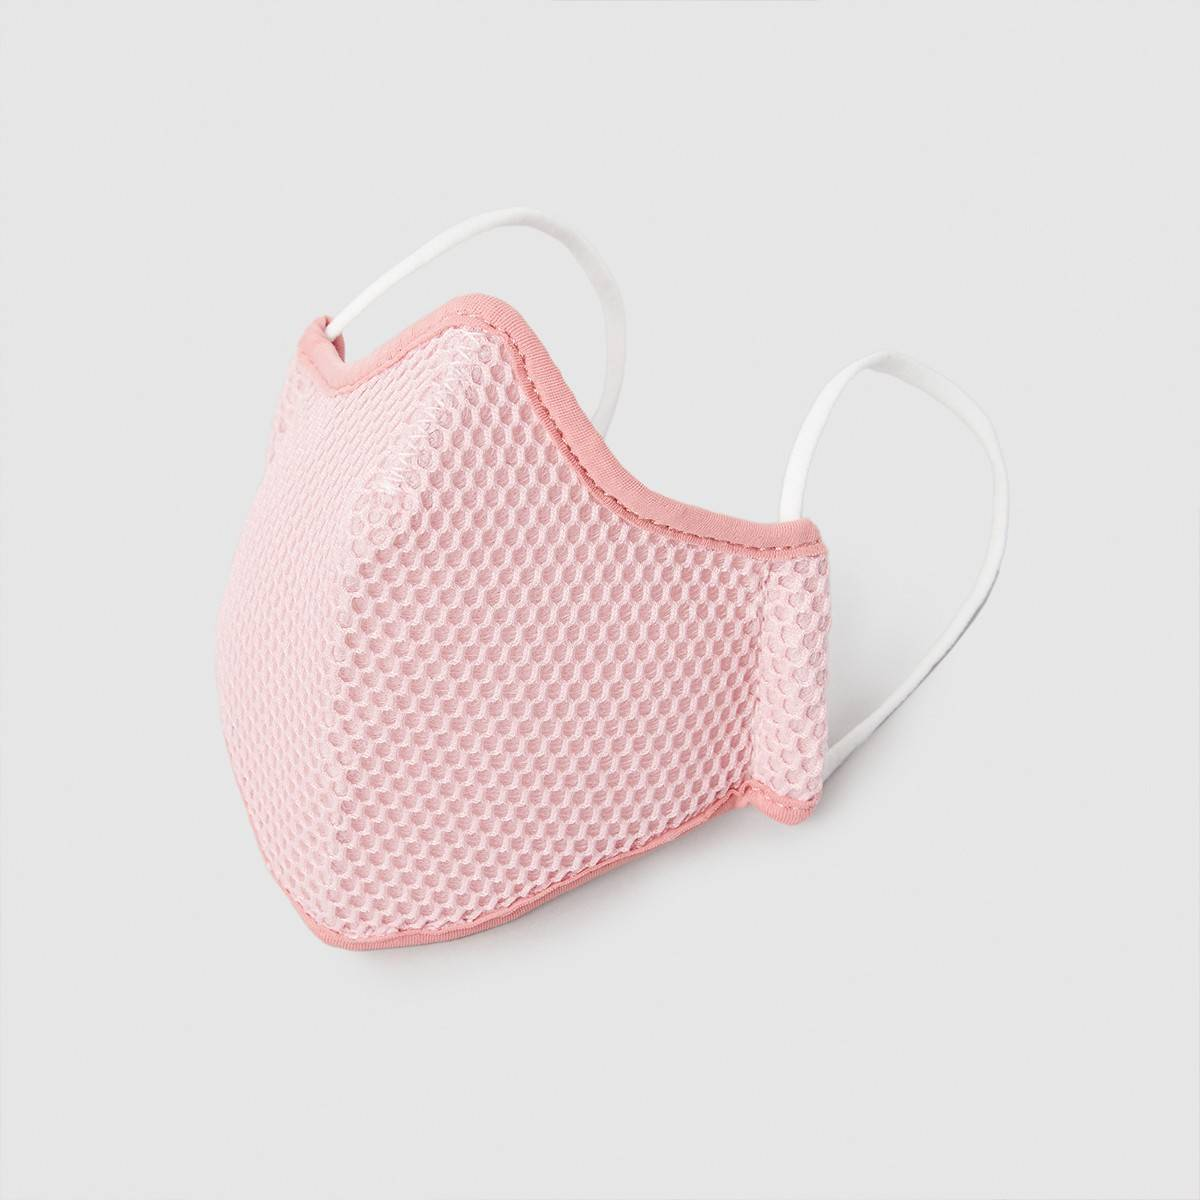 mascarilla higiénica reutilizable rosa